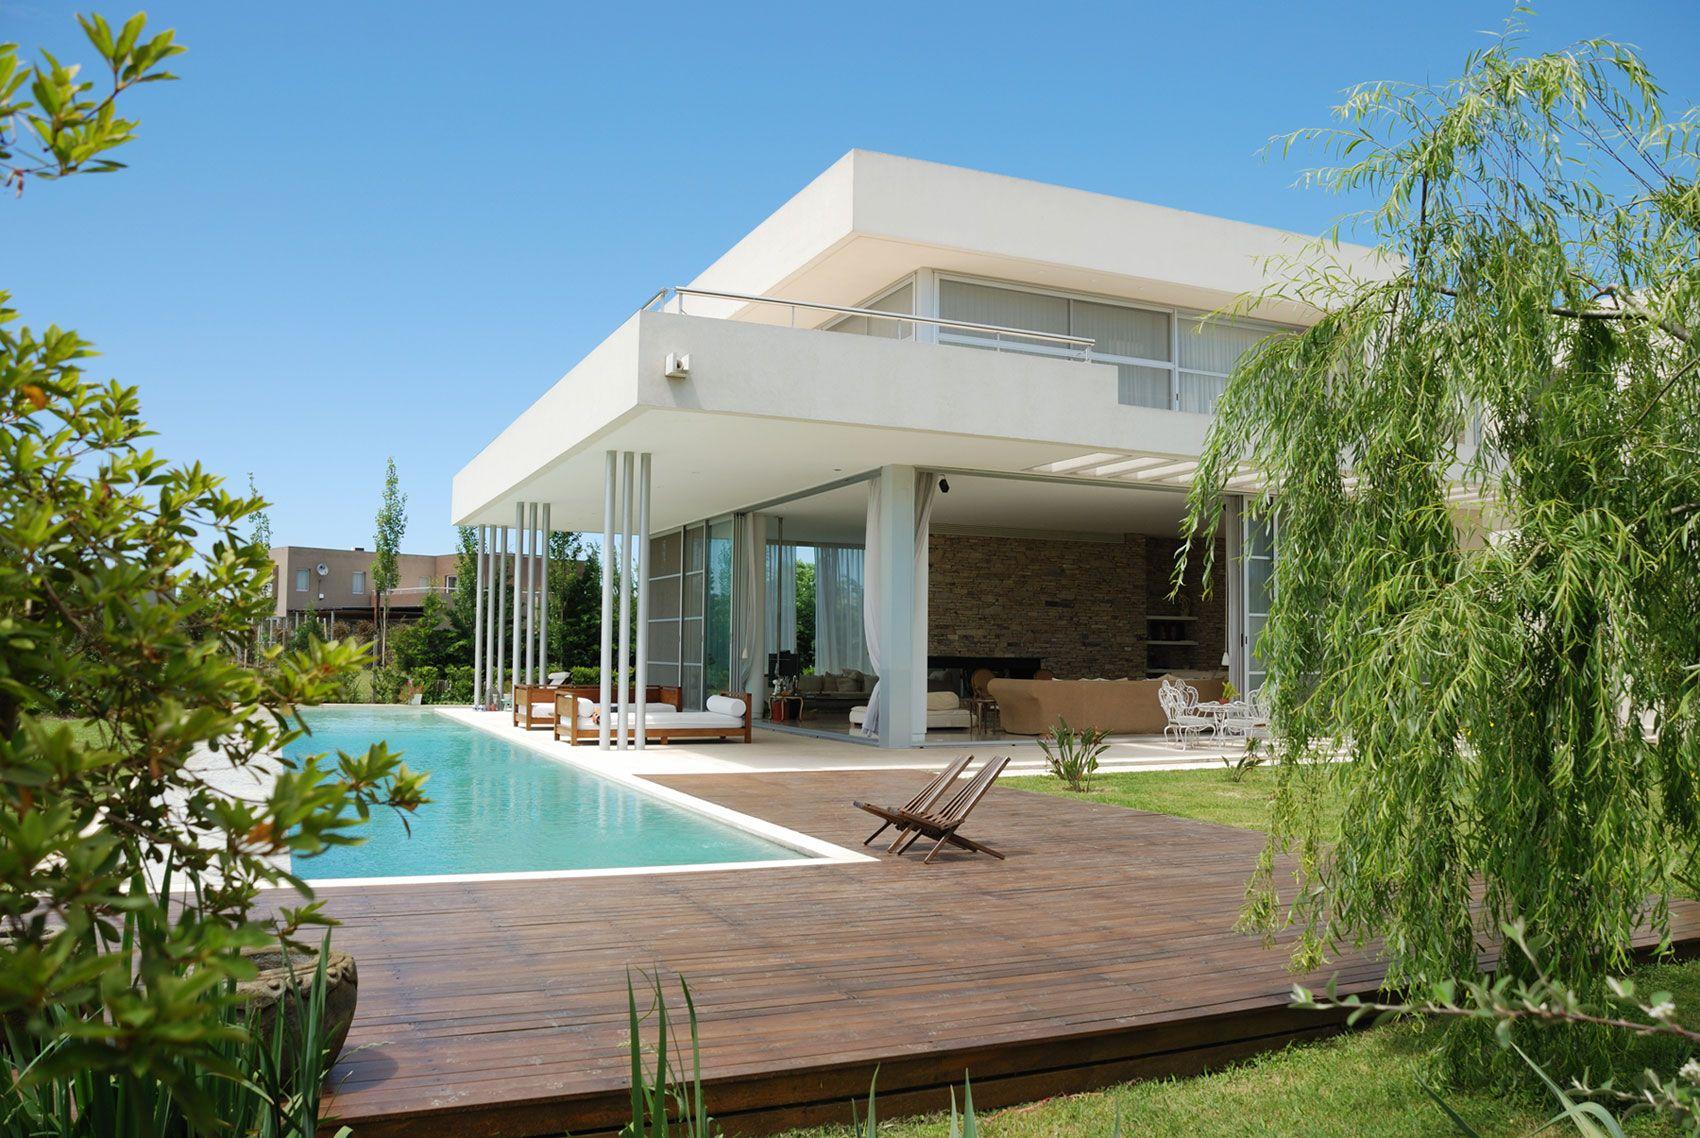 modern house modern houses pinterest pool house designs